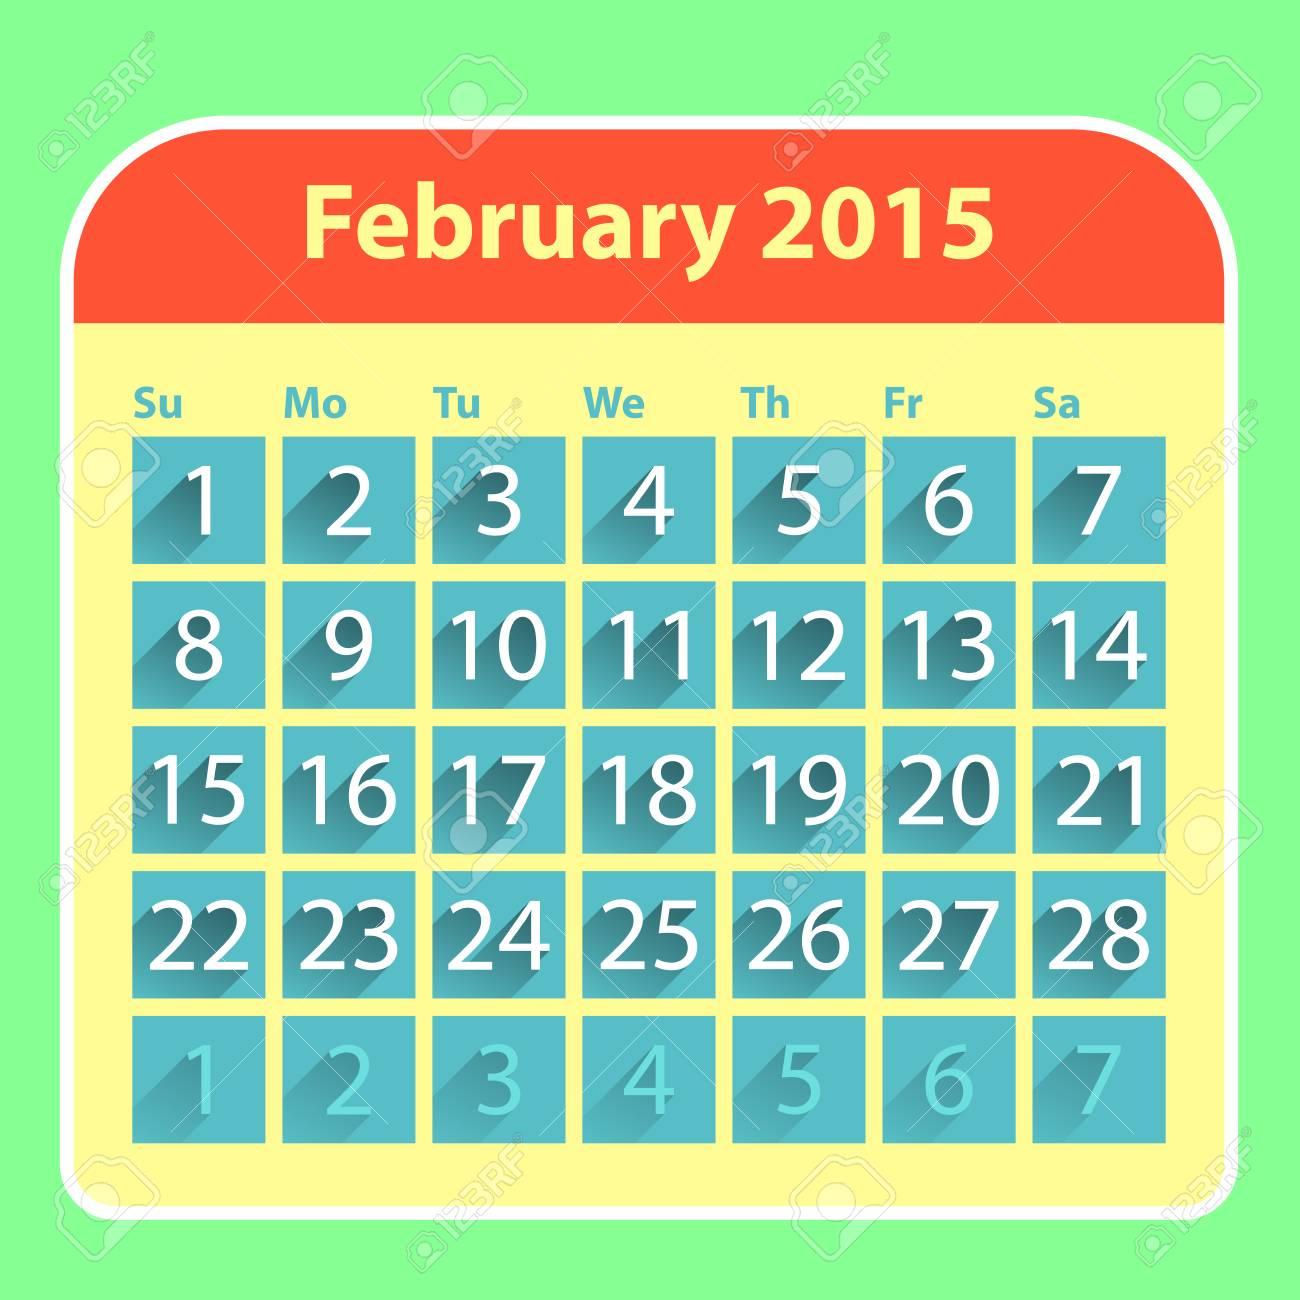 Flat Style February 2015 Calendar Design Template Royalty Free